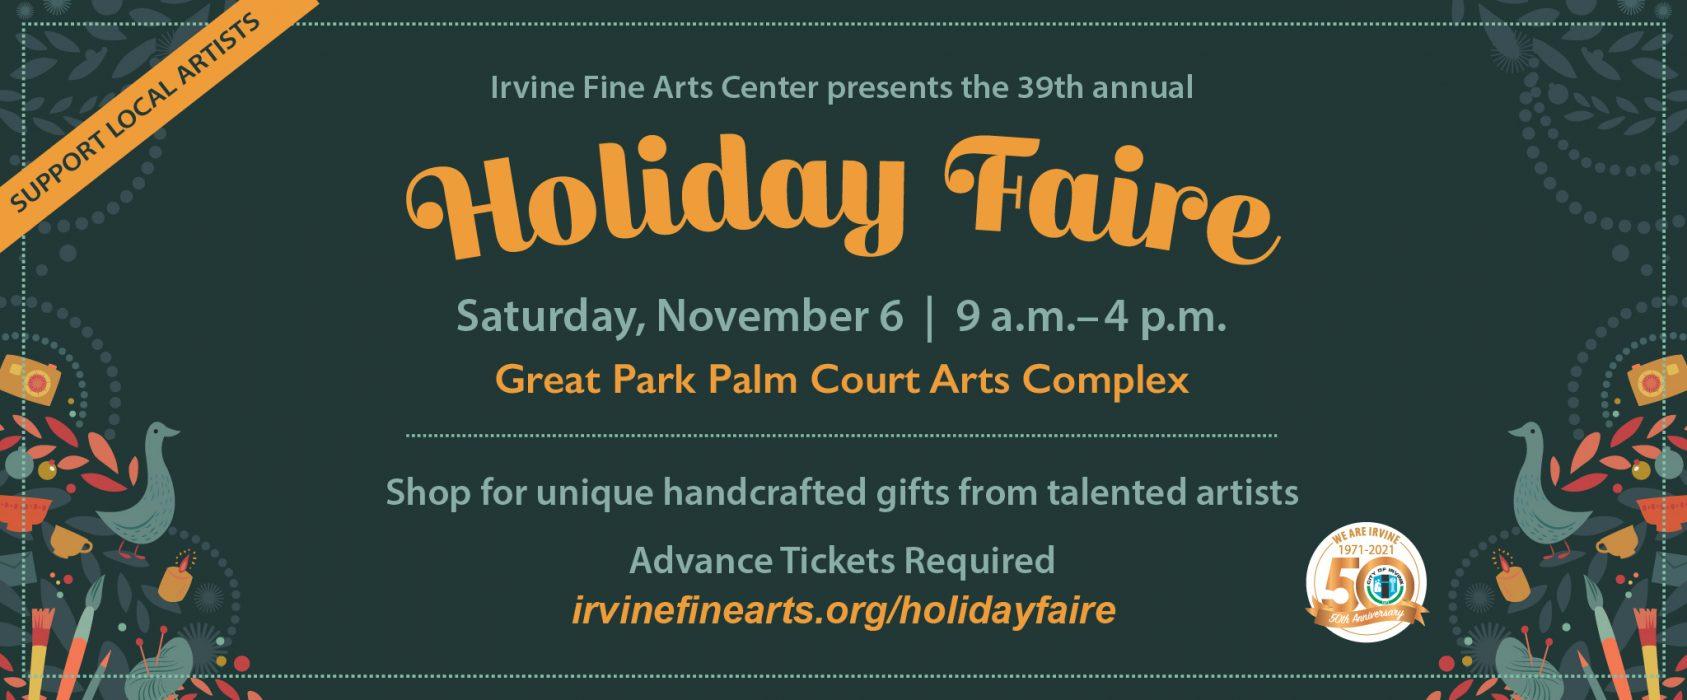 2021.10.19-11.7 Irvine Holiday Faire